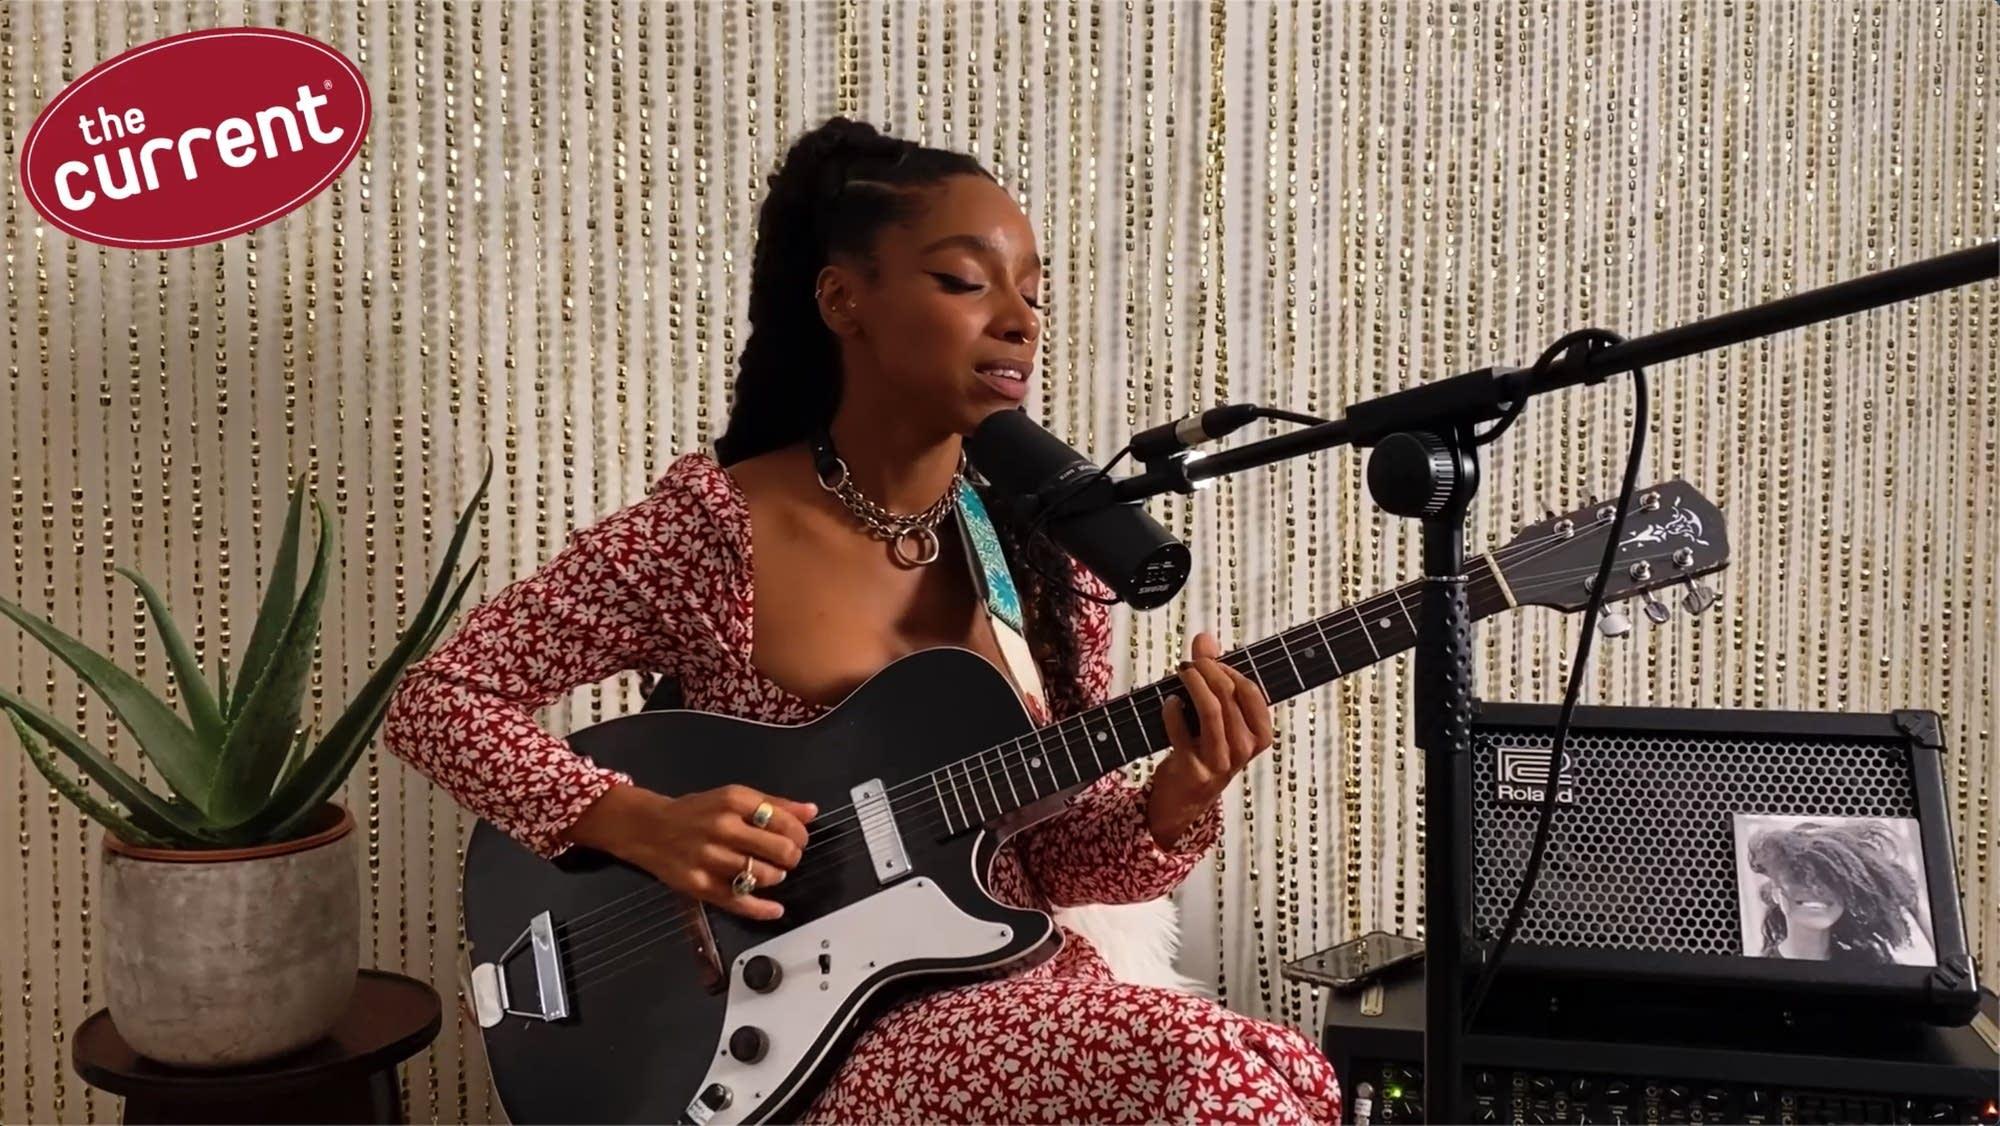 Lianne La Havas singing and playing guitar